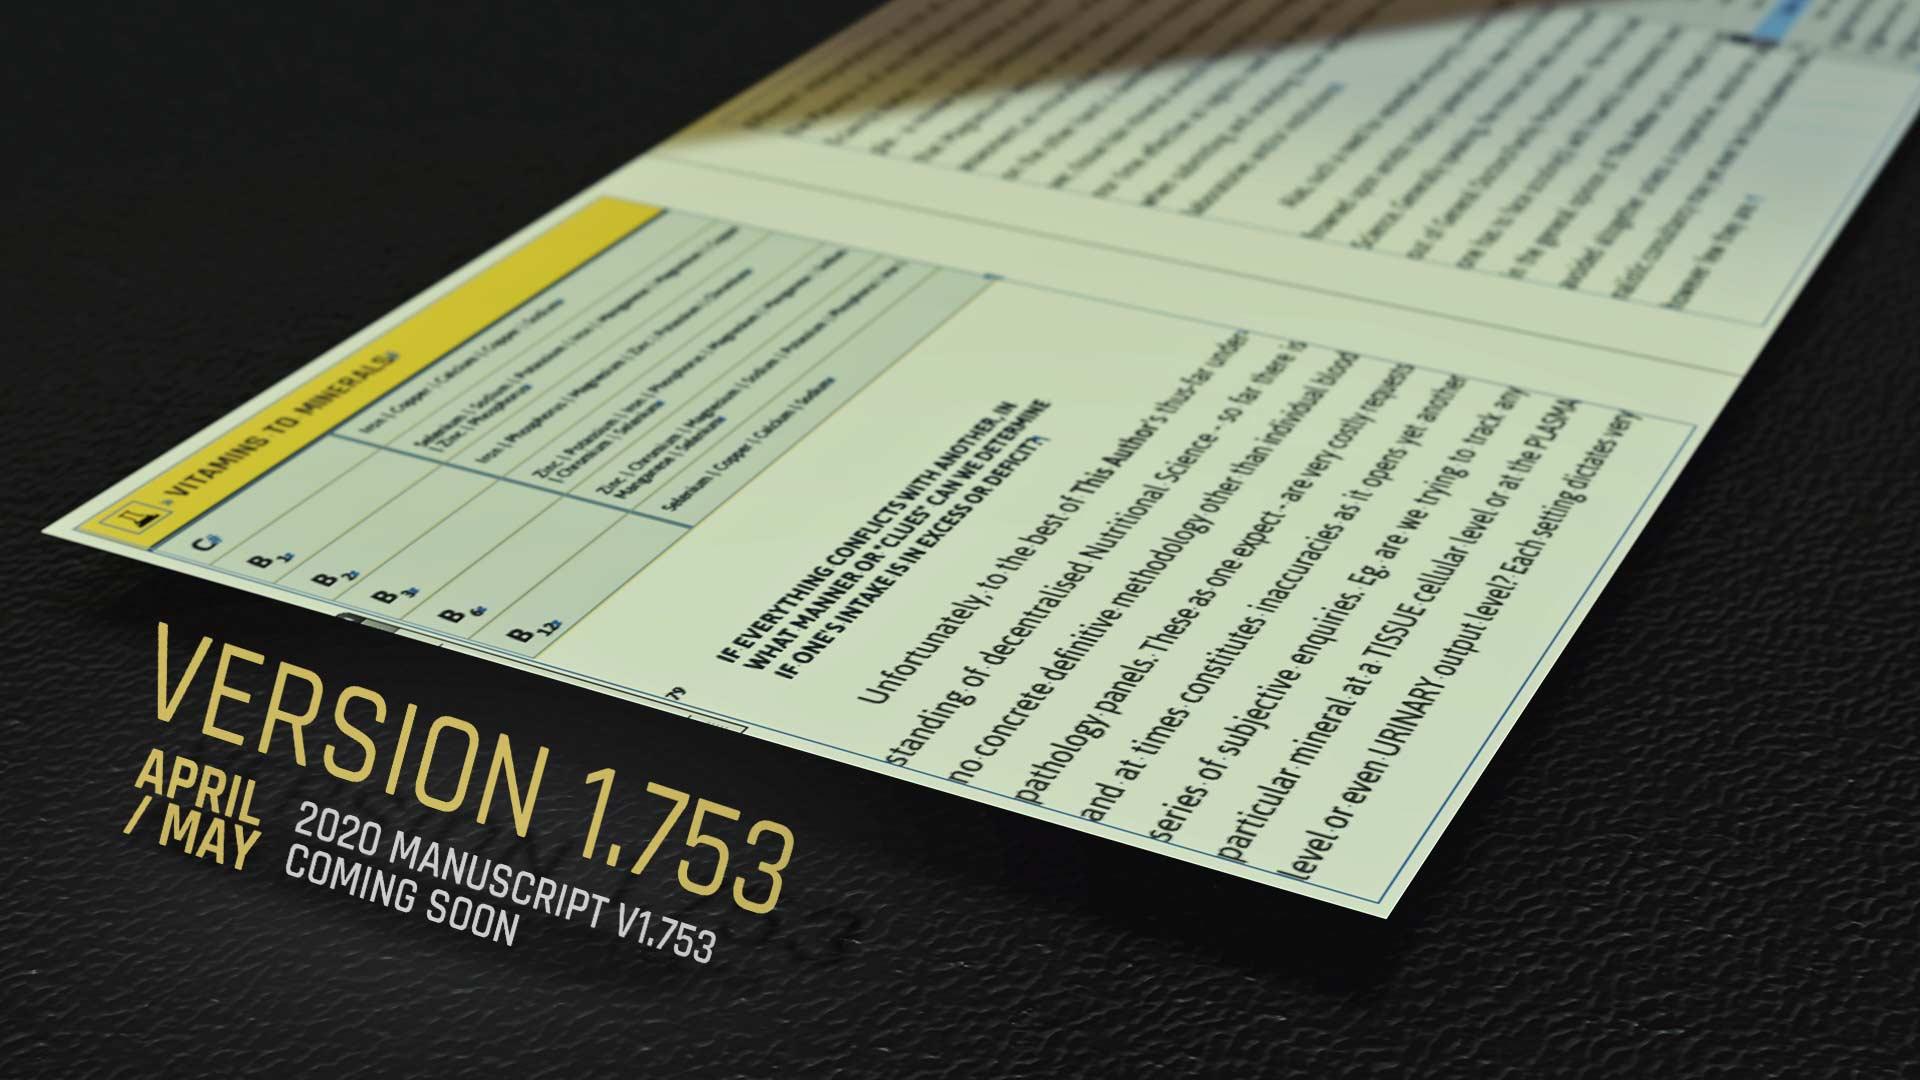 Coming Soon: Version 1.753 of manuscript